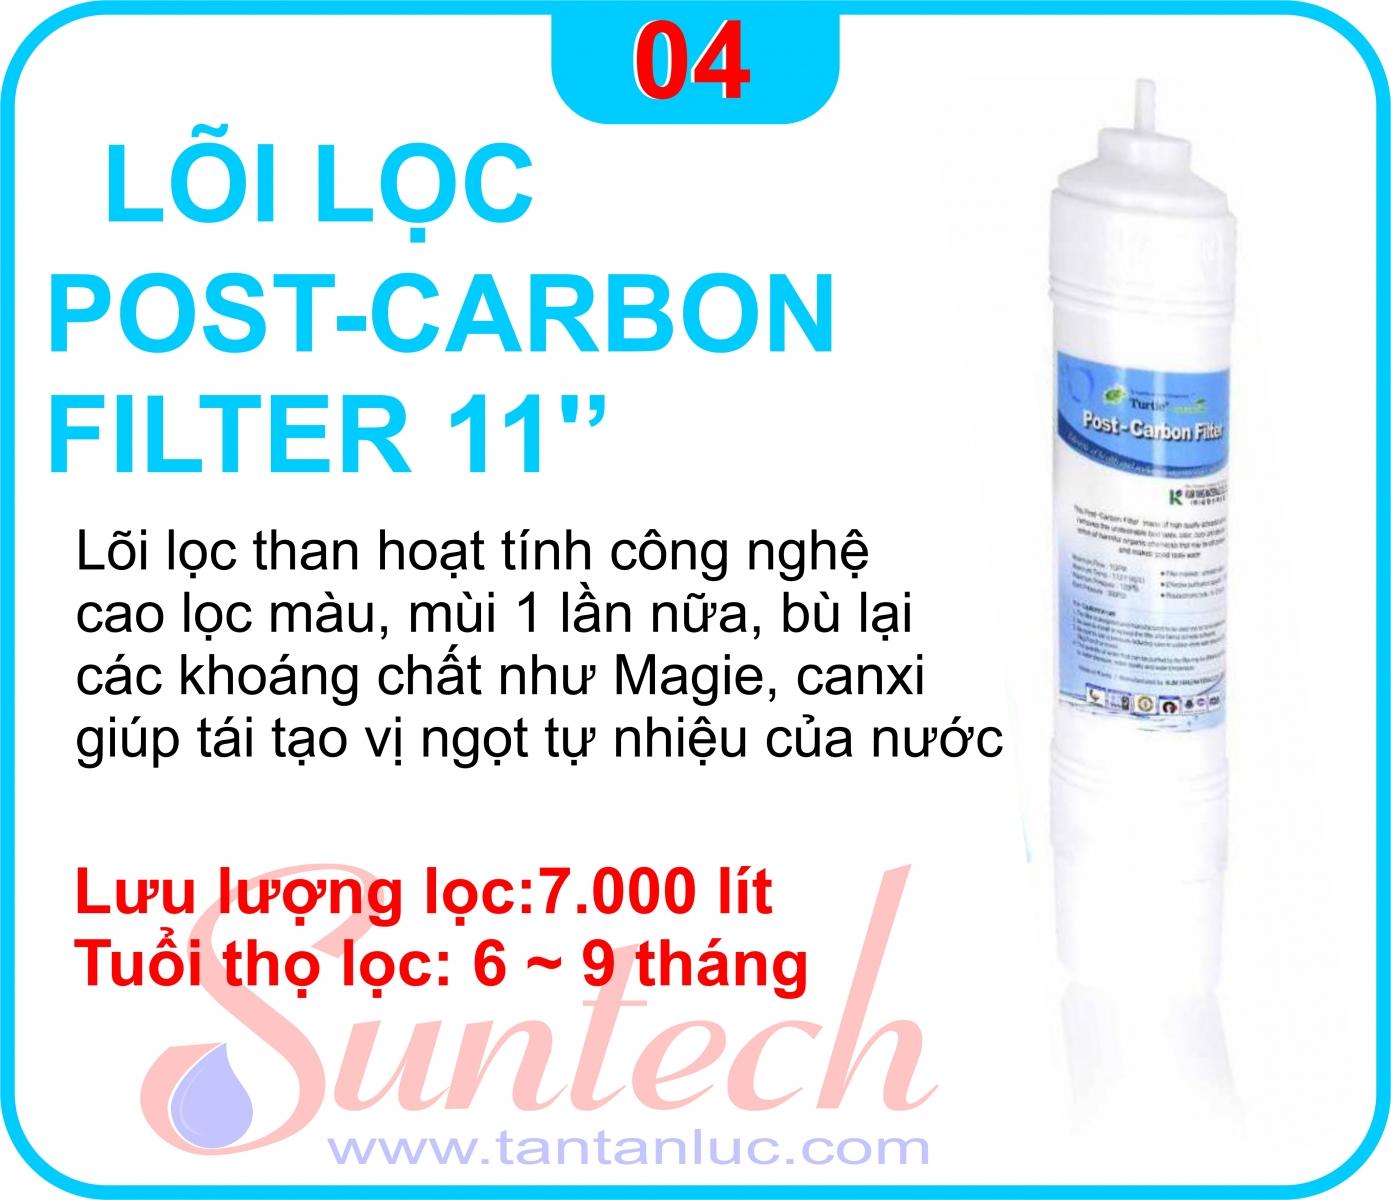 may-loc-nuoc-2-voi-lanh-Fiter-Korea-ST-01CO-MH-205